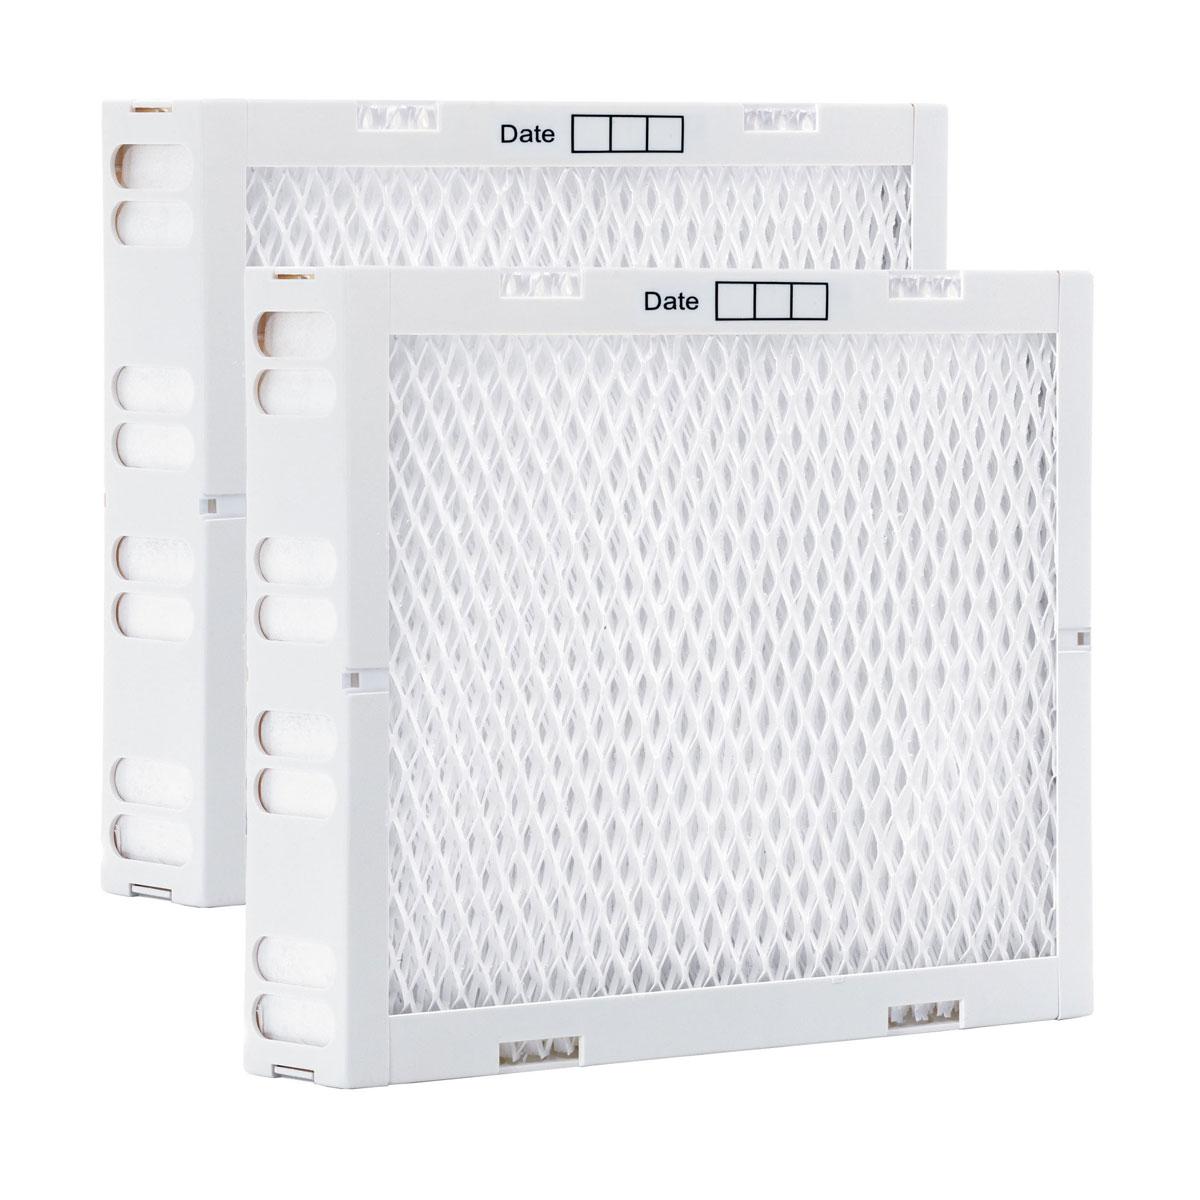 Stadler Form O-030 фильтры для увлажнителя воздуха Oskar, 2 шт. все цены